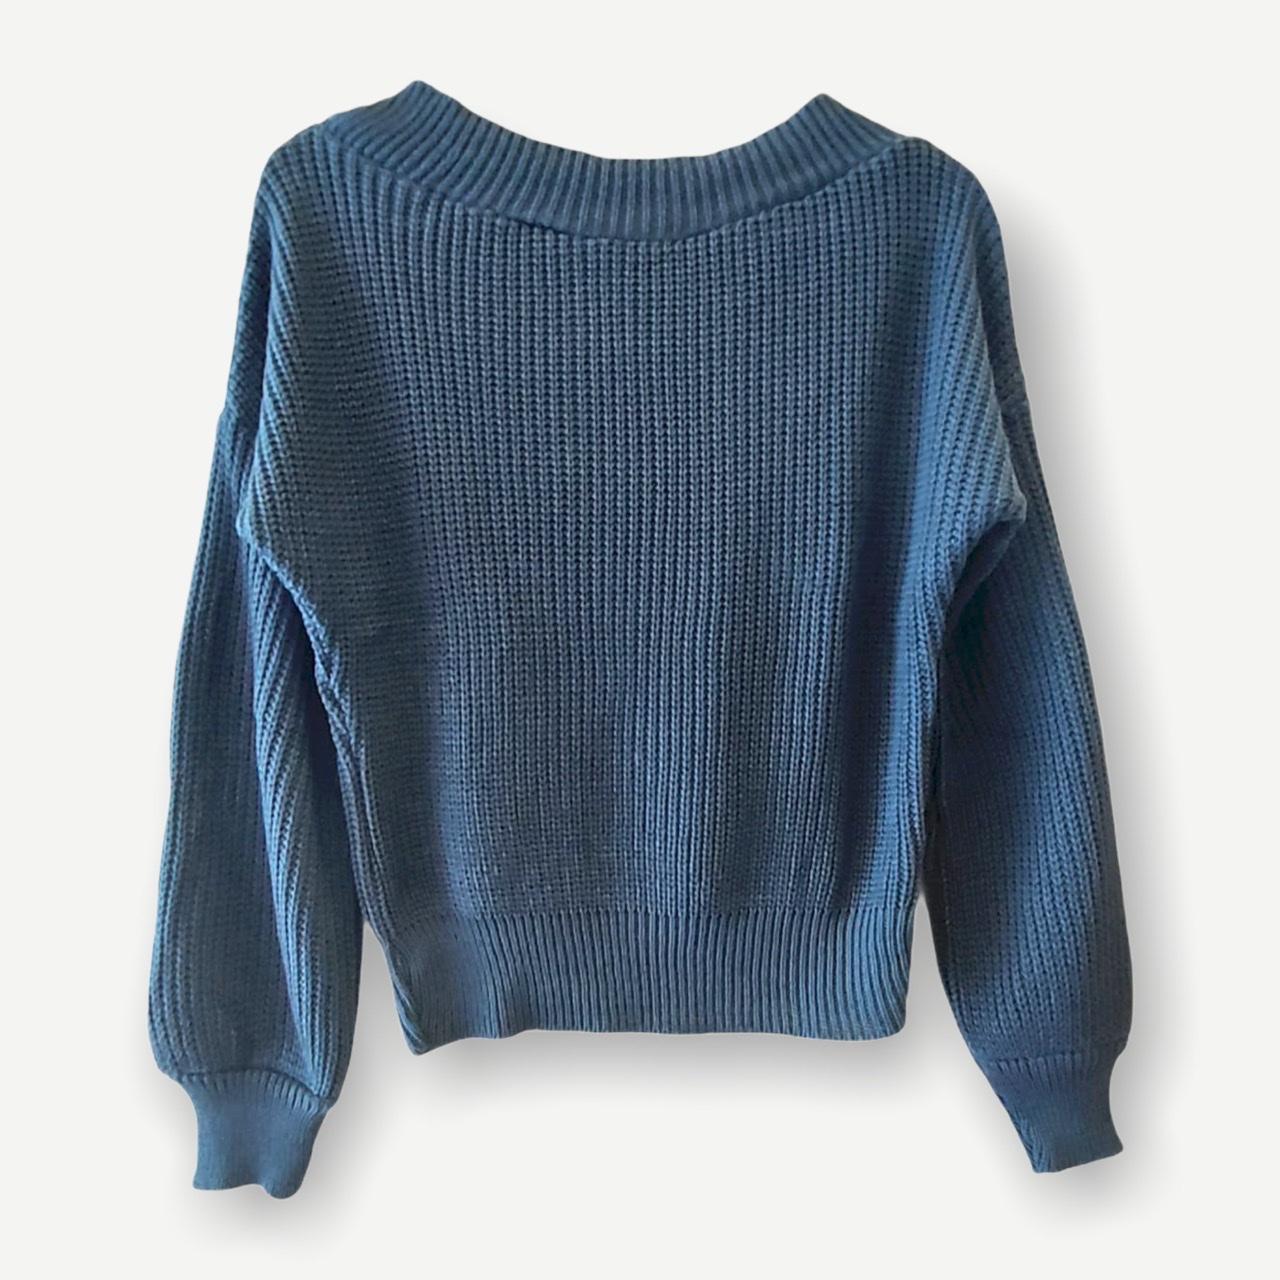 Blusa Juliana azul tricot  - Vivian Bógus